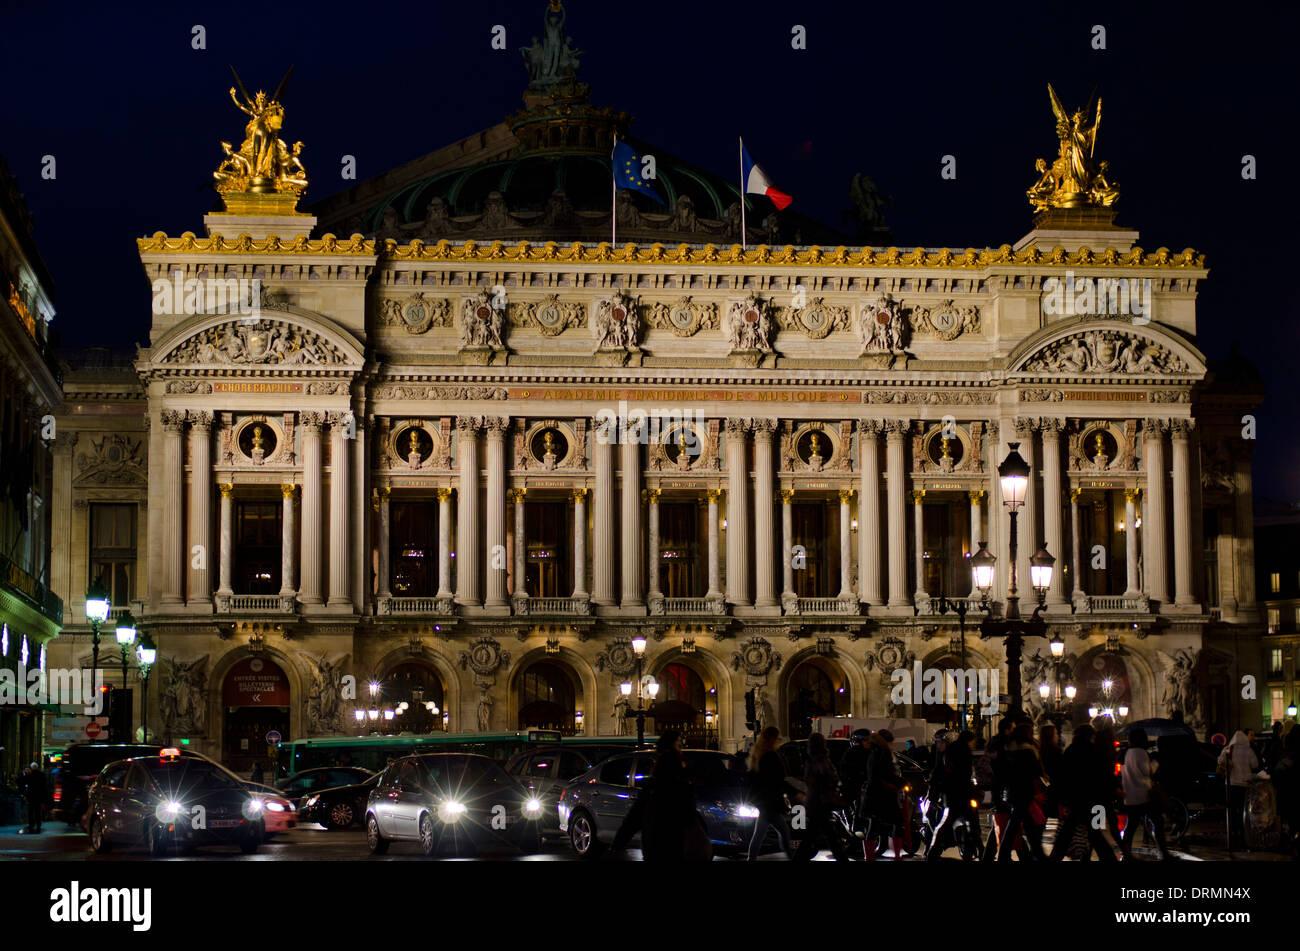 The Palais Garnier, Opera House in Paris at night, France. Stock Photo